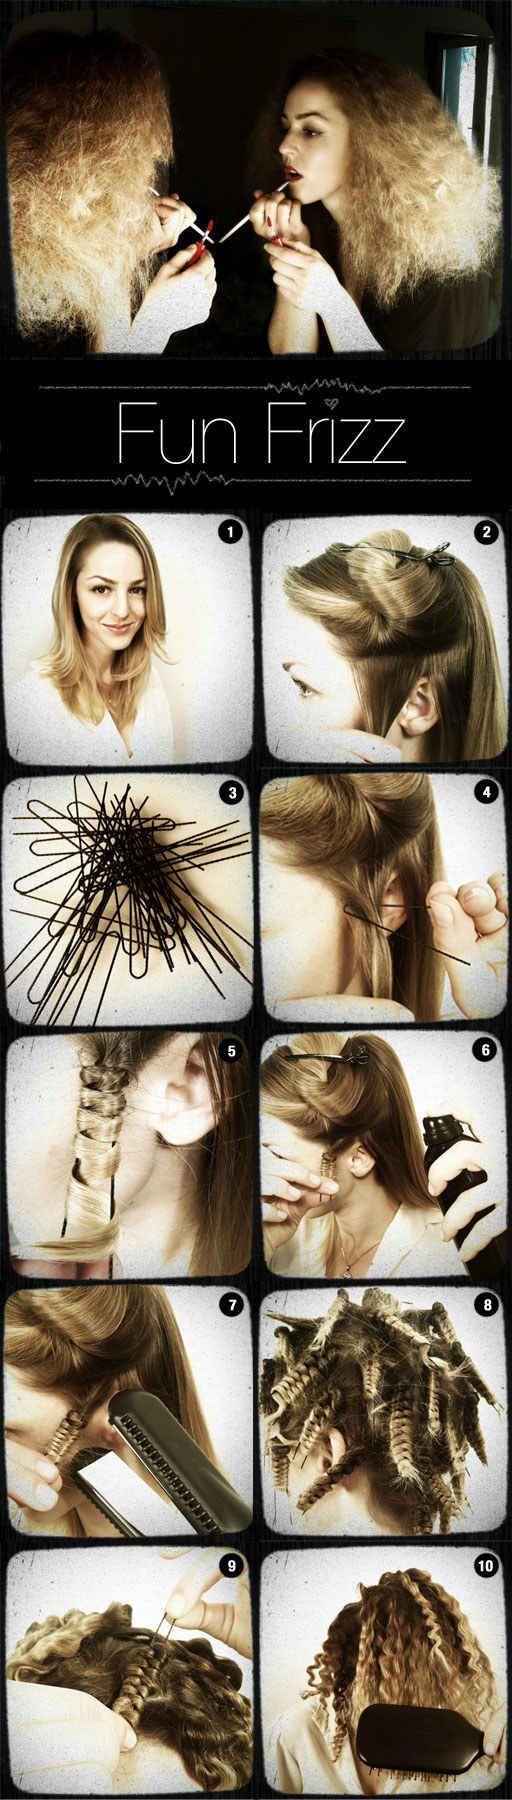 Harry Potter Alert! This Bellatrix Lestrange hair that makes frizz look good.